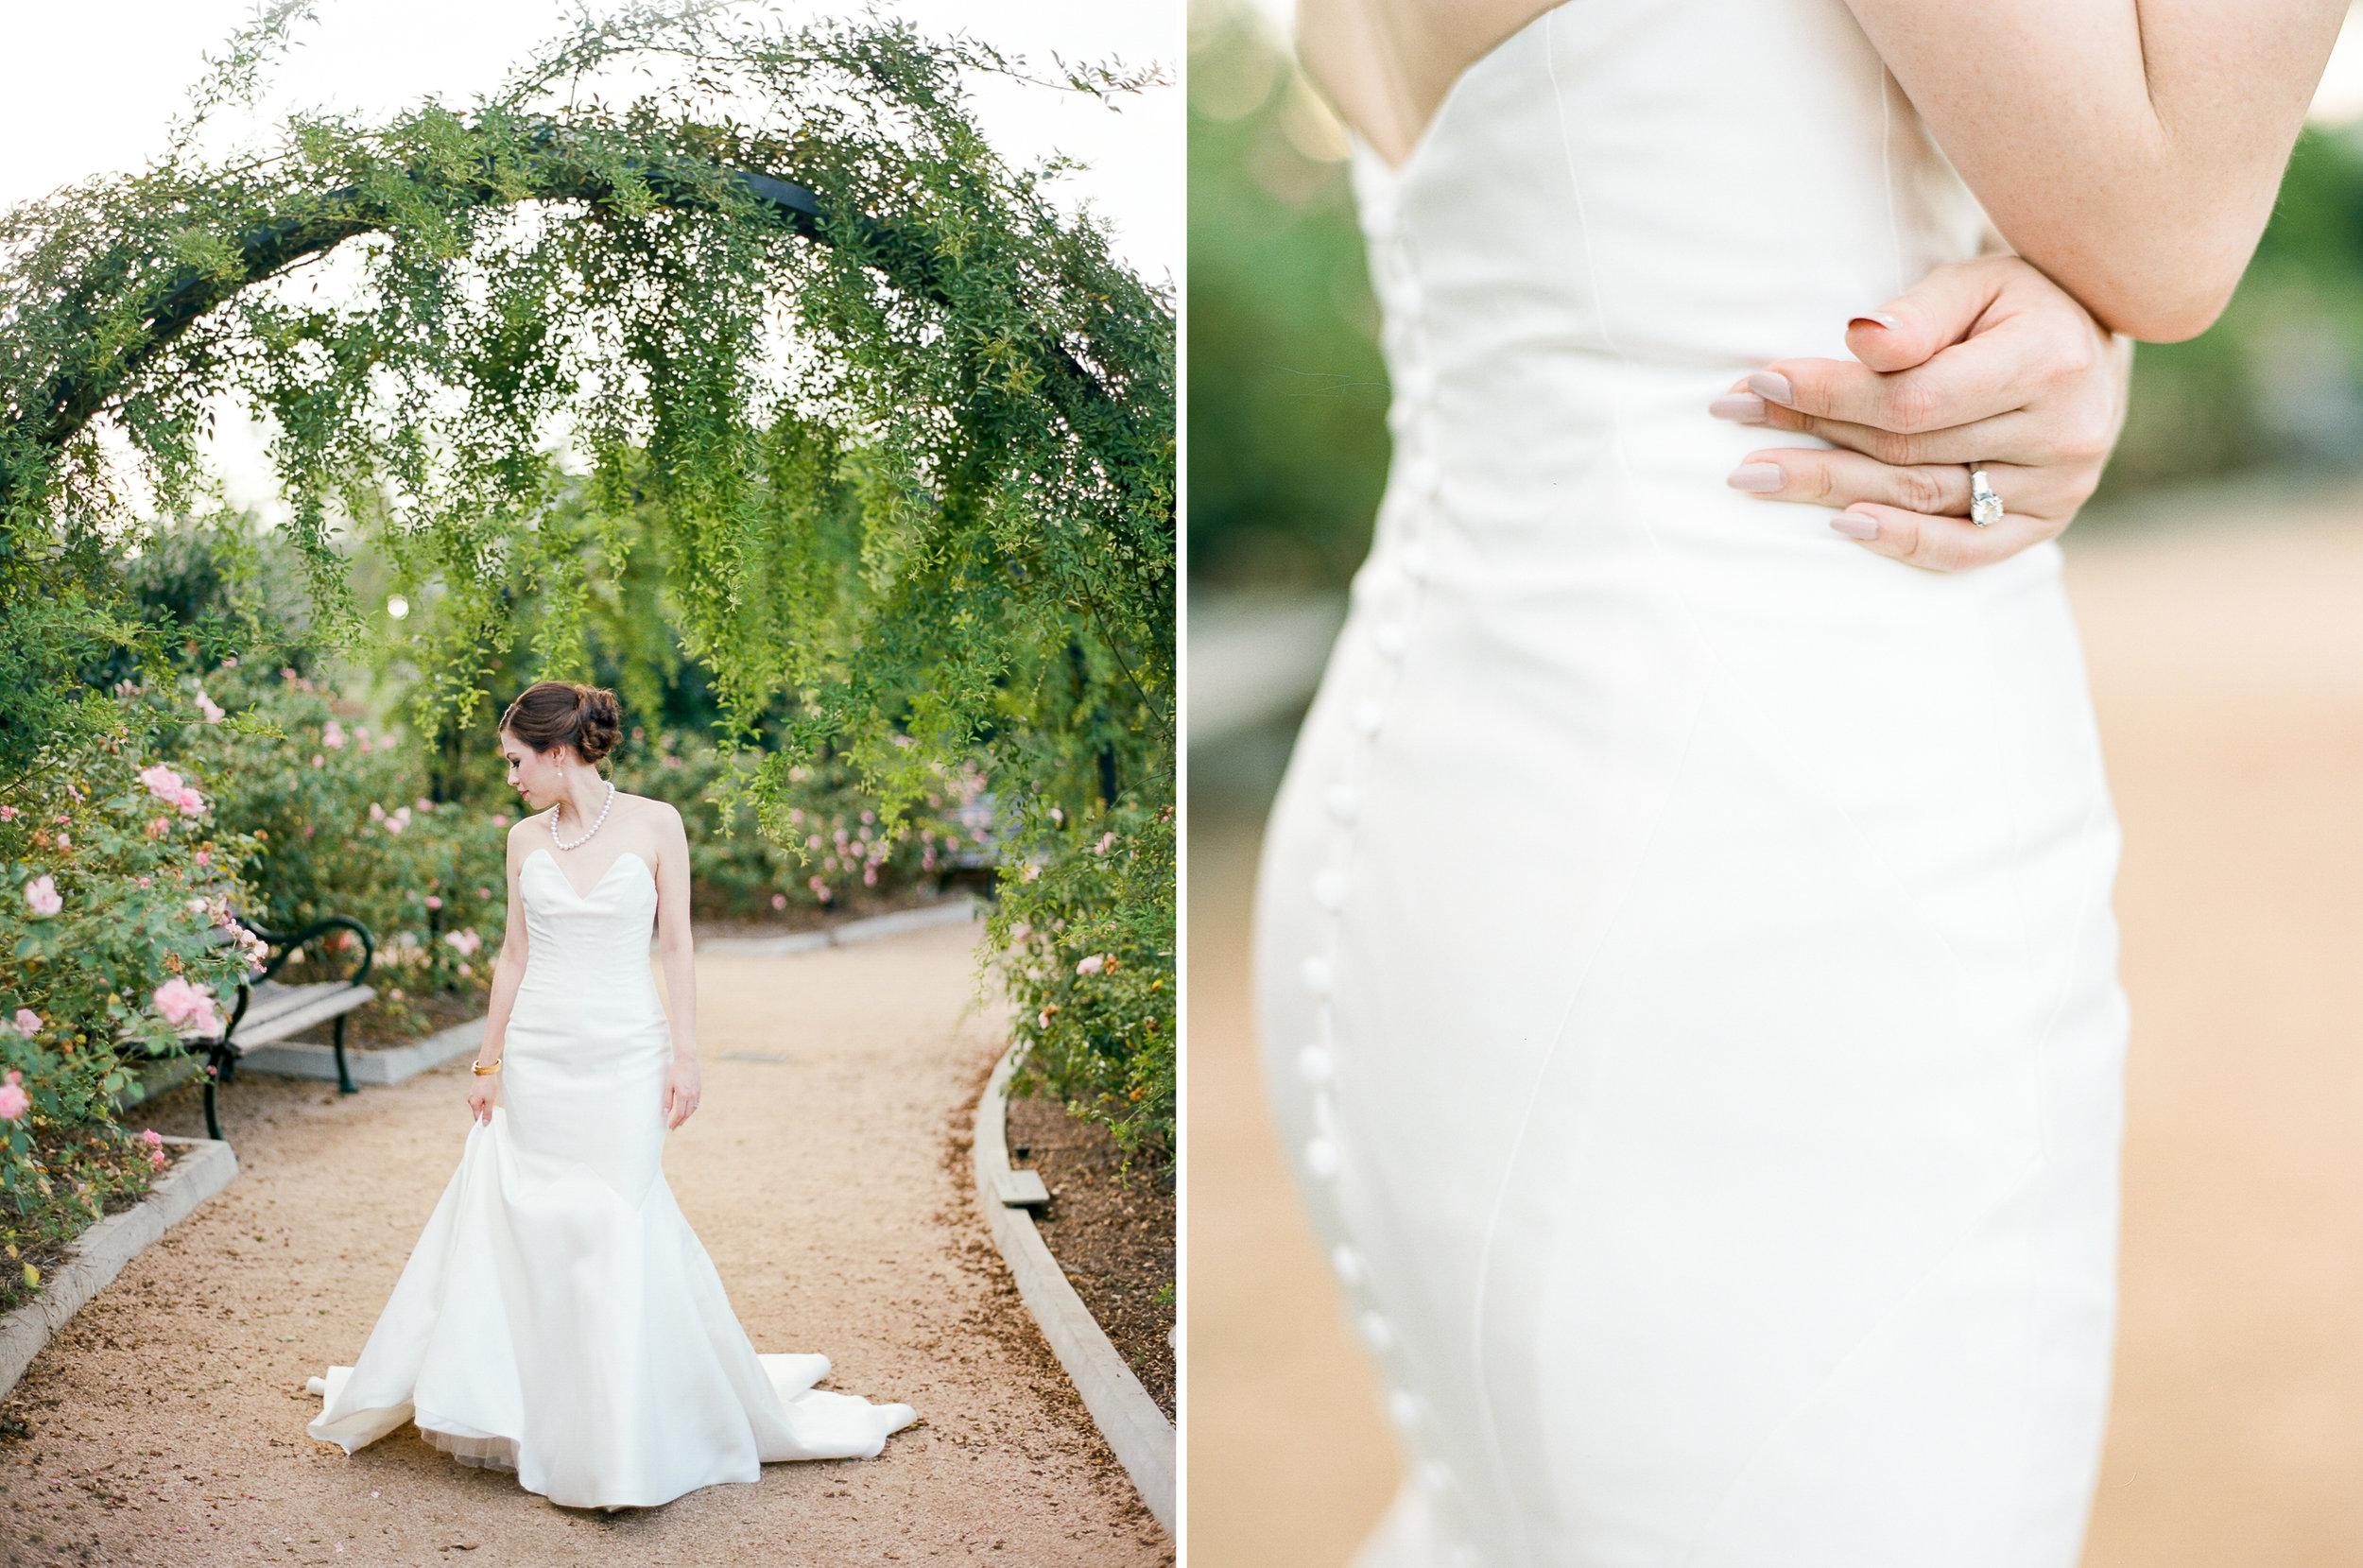 mcgovern-centennial-gardens-wedding-houston-wedding-photographer-bridals-film-austin-wedding-photographer-103.jpg